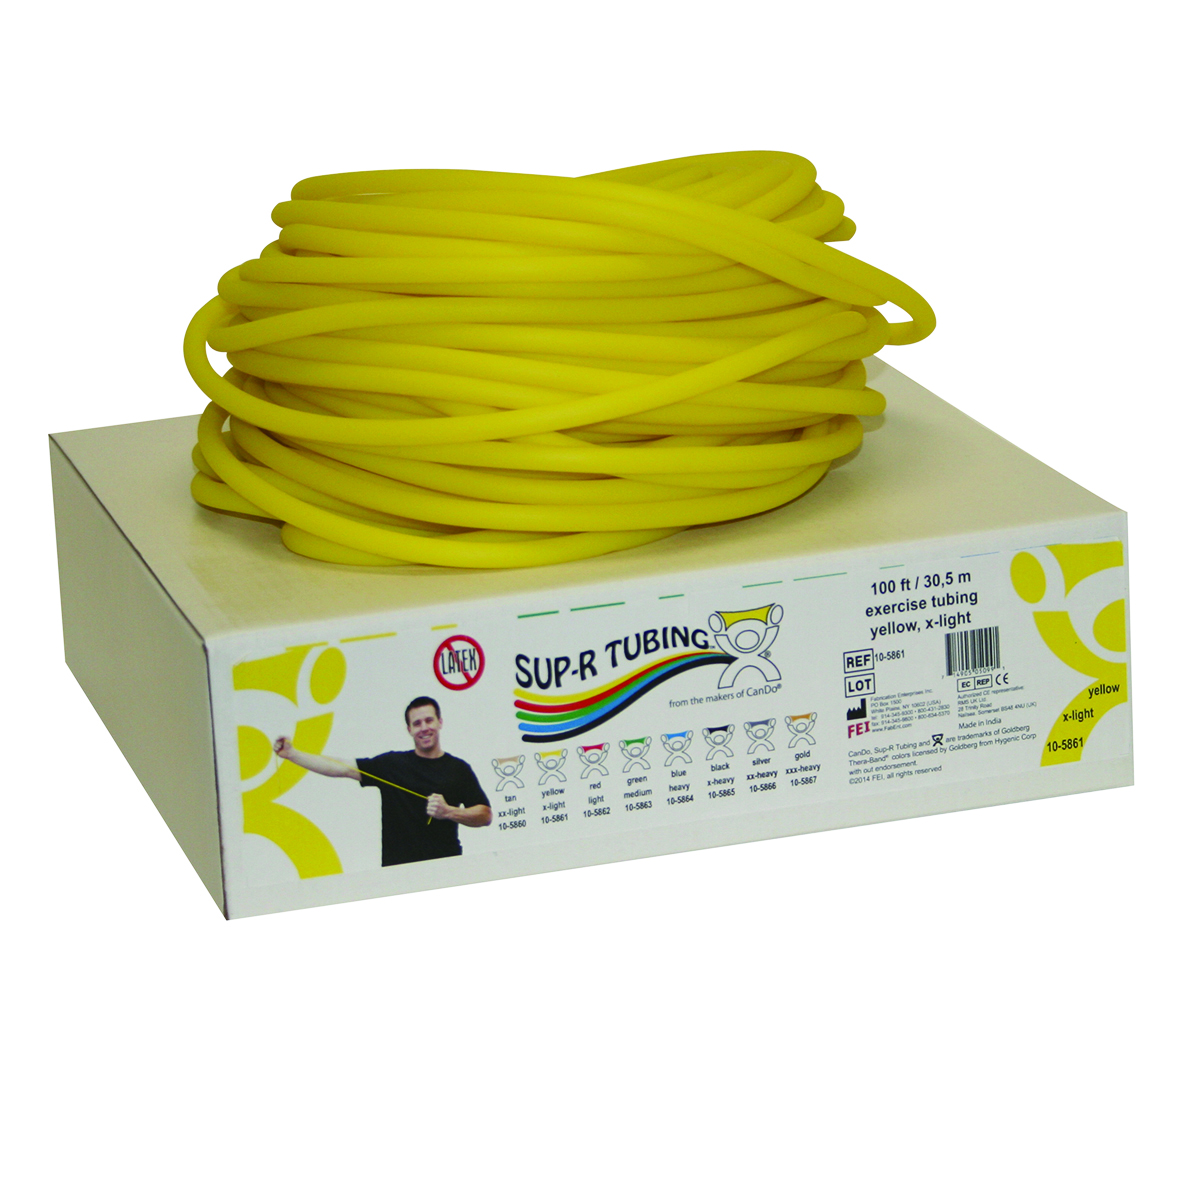 Sup-R Tubing® Latex Free Exercise Tubing Rolls